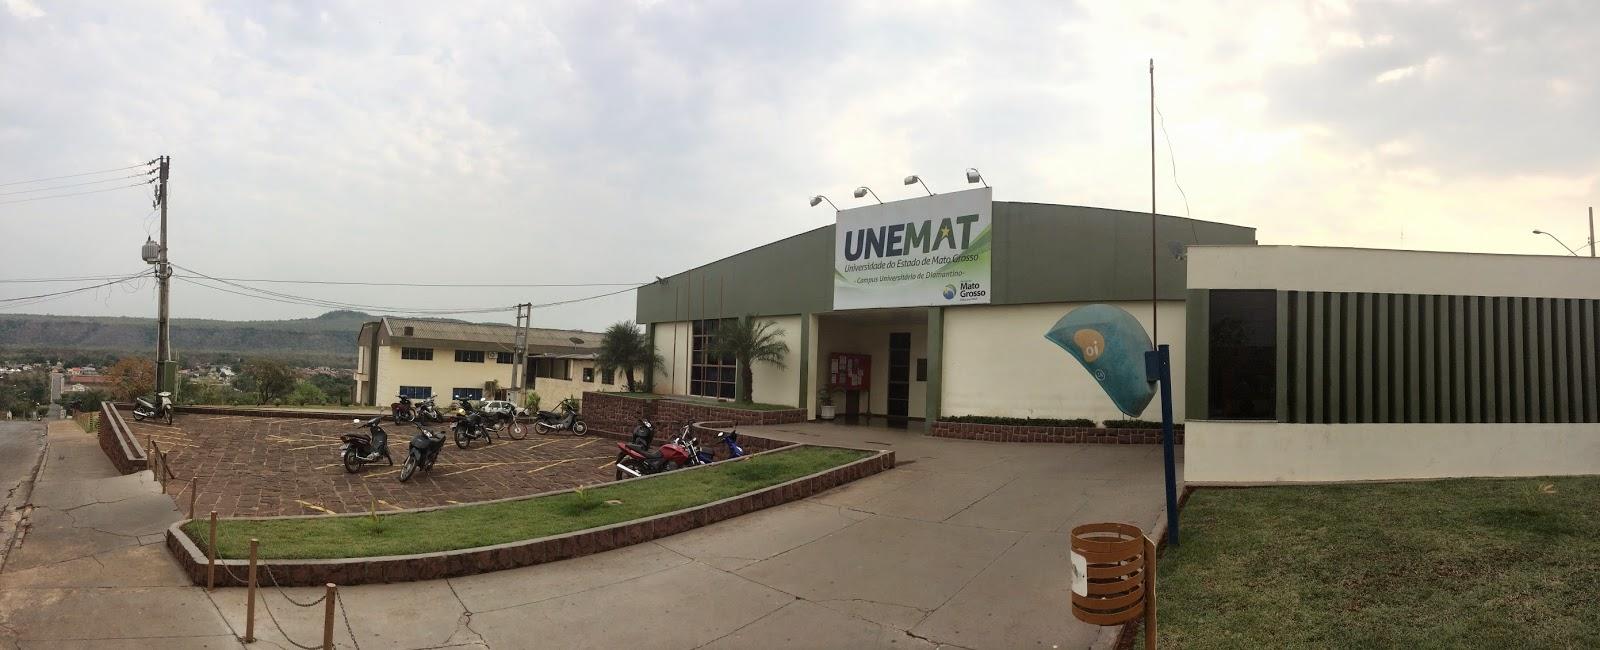 Unemat, Diamantino | Mato Grosso, Brasil